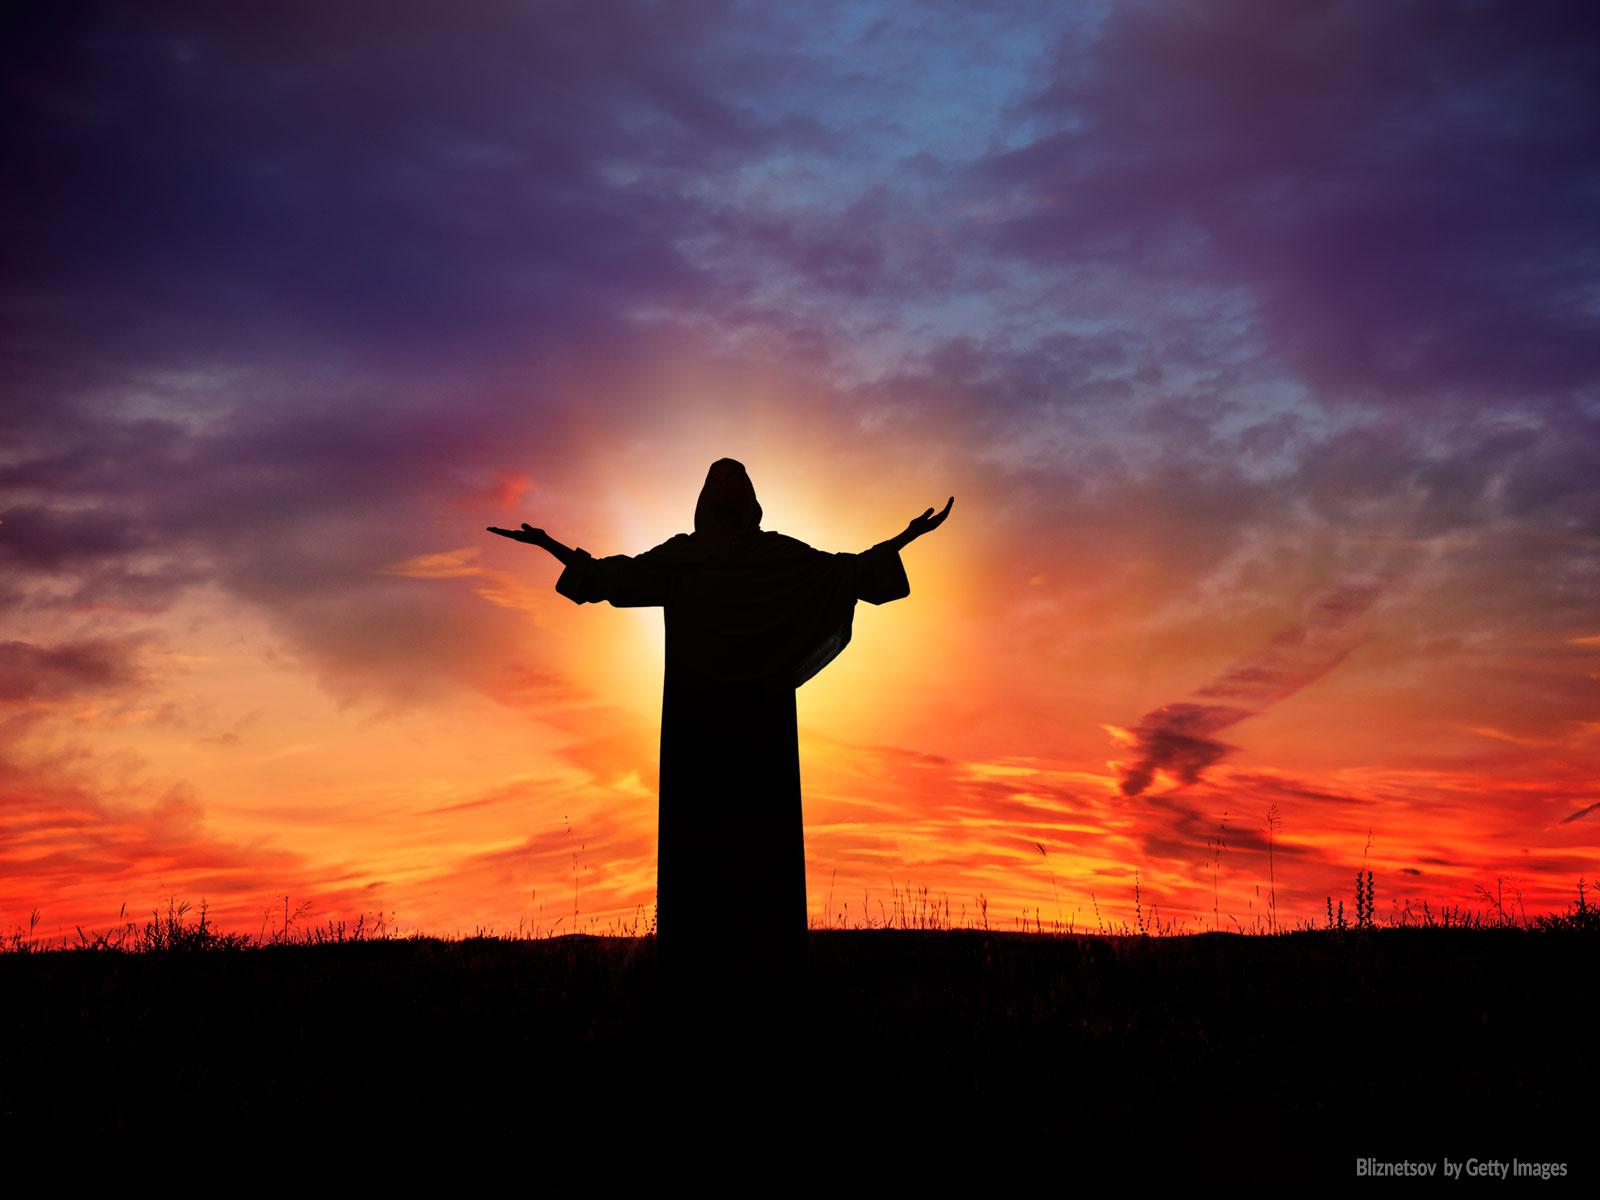 -Jesus-Cristo-soube-amar-e-ser-amado-por-seus-amigos